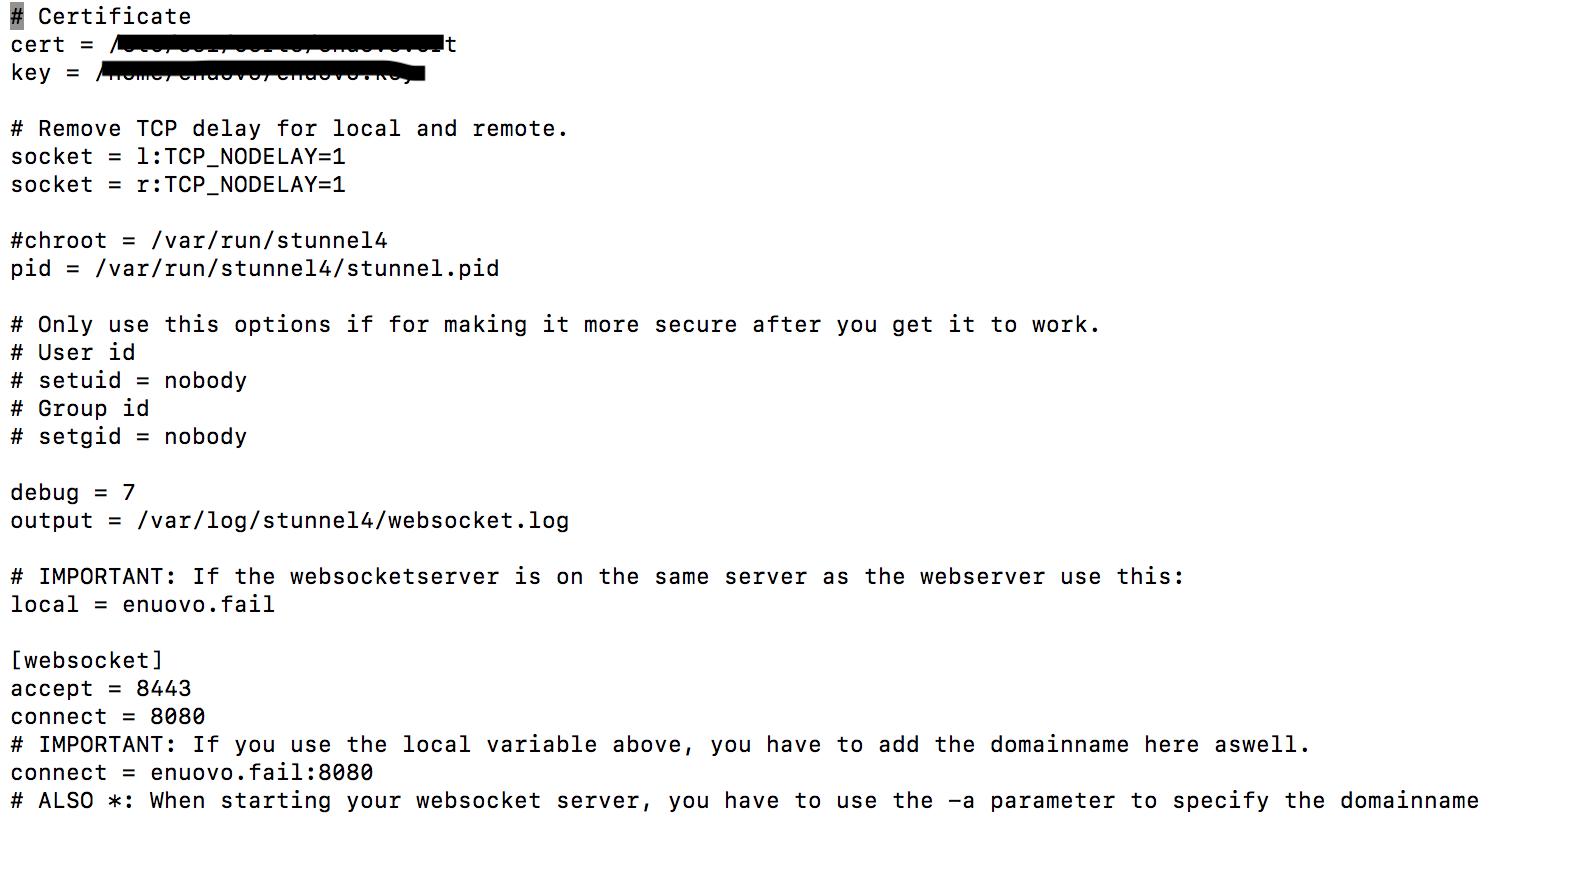 Error establishing connection in SSL · Issue #272